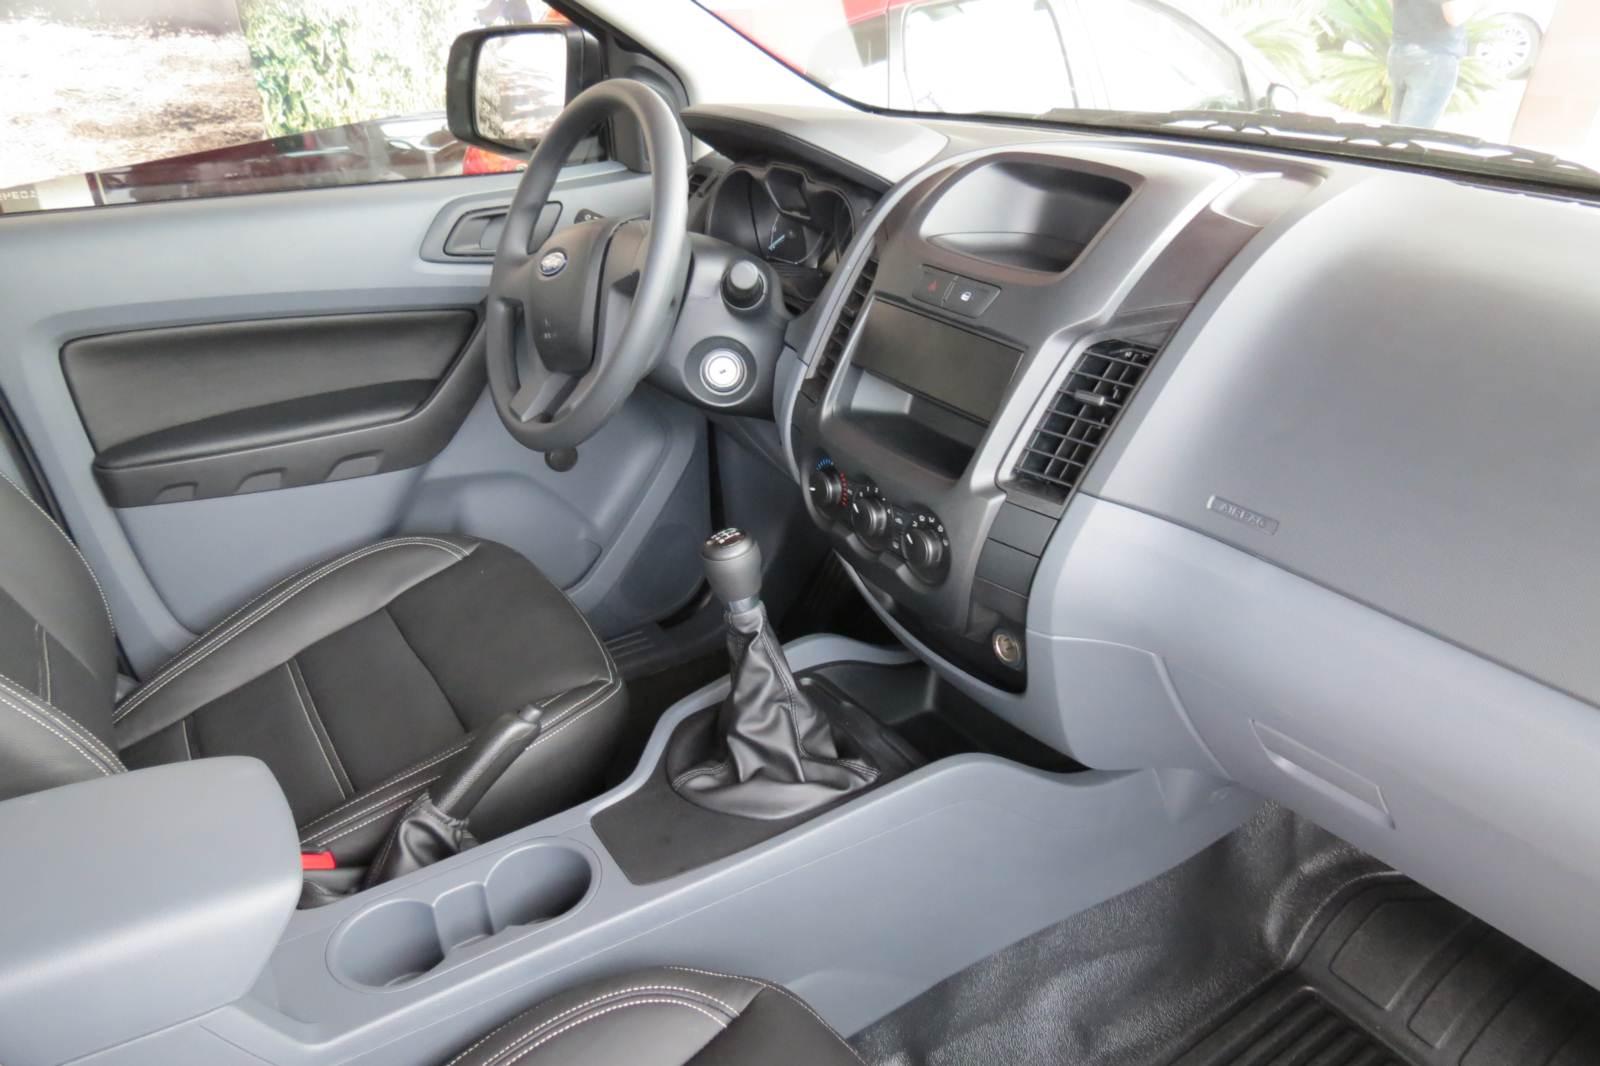 Ford Ranger XL 2.5 Flex Cabine Dupla